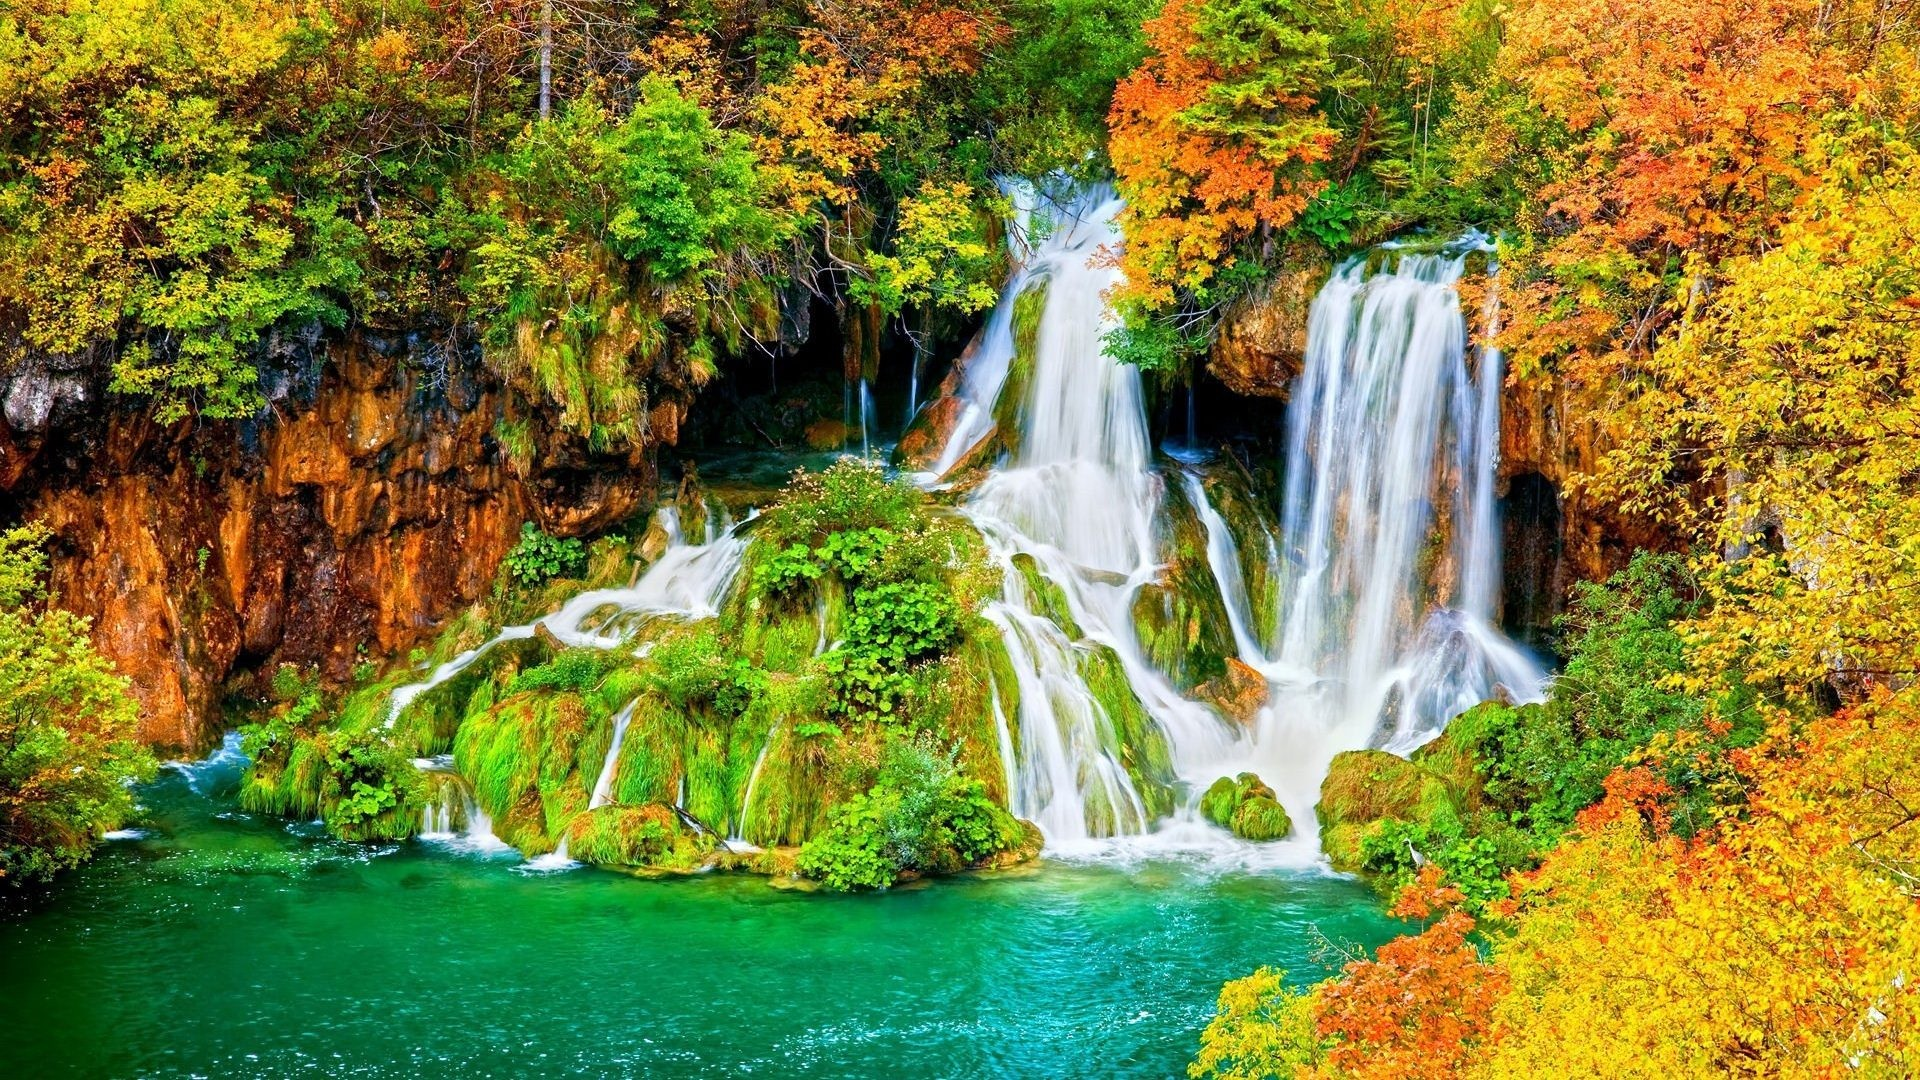 Waterfall Autumn Nature Waterfalls Animated Wallpaper